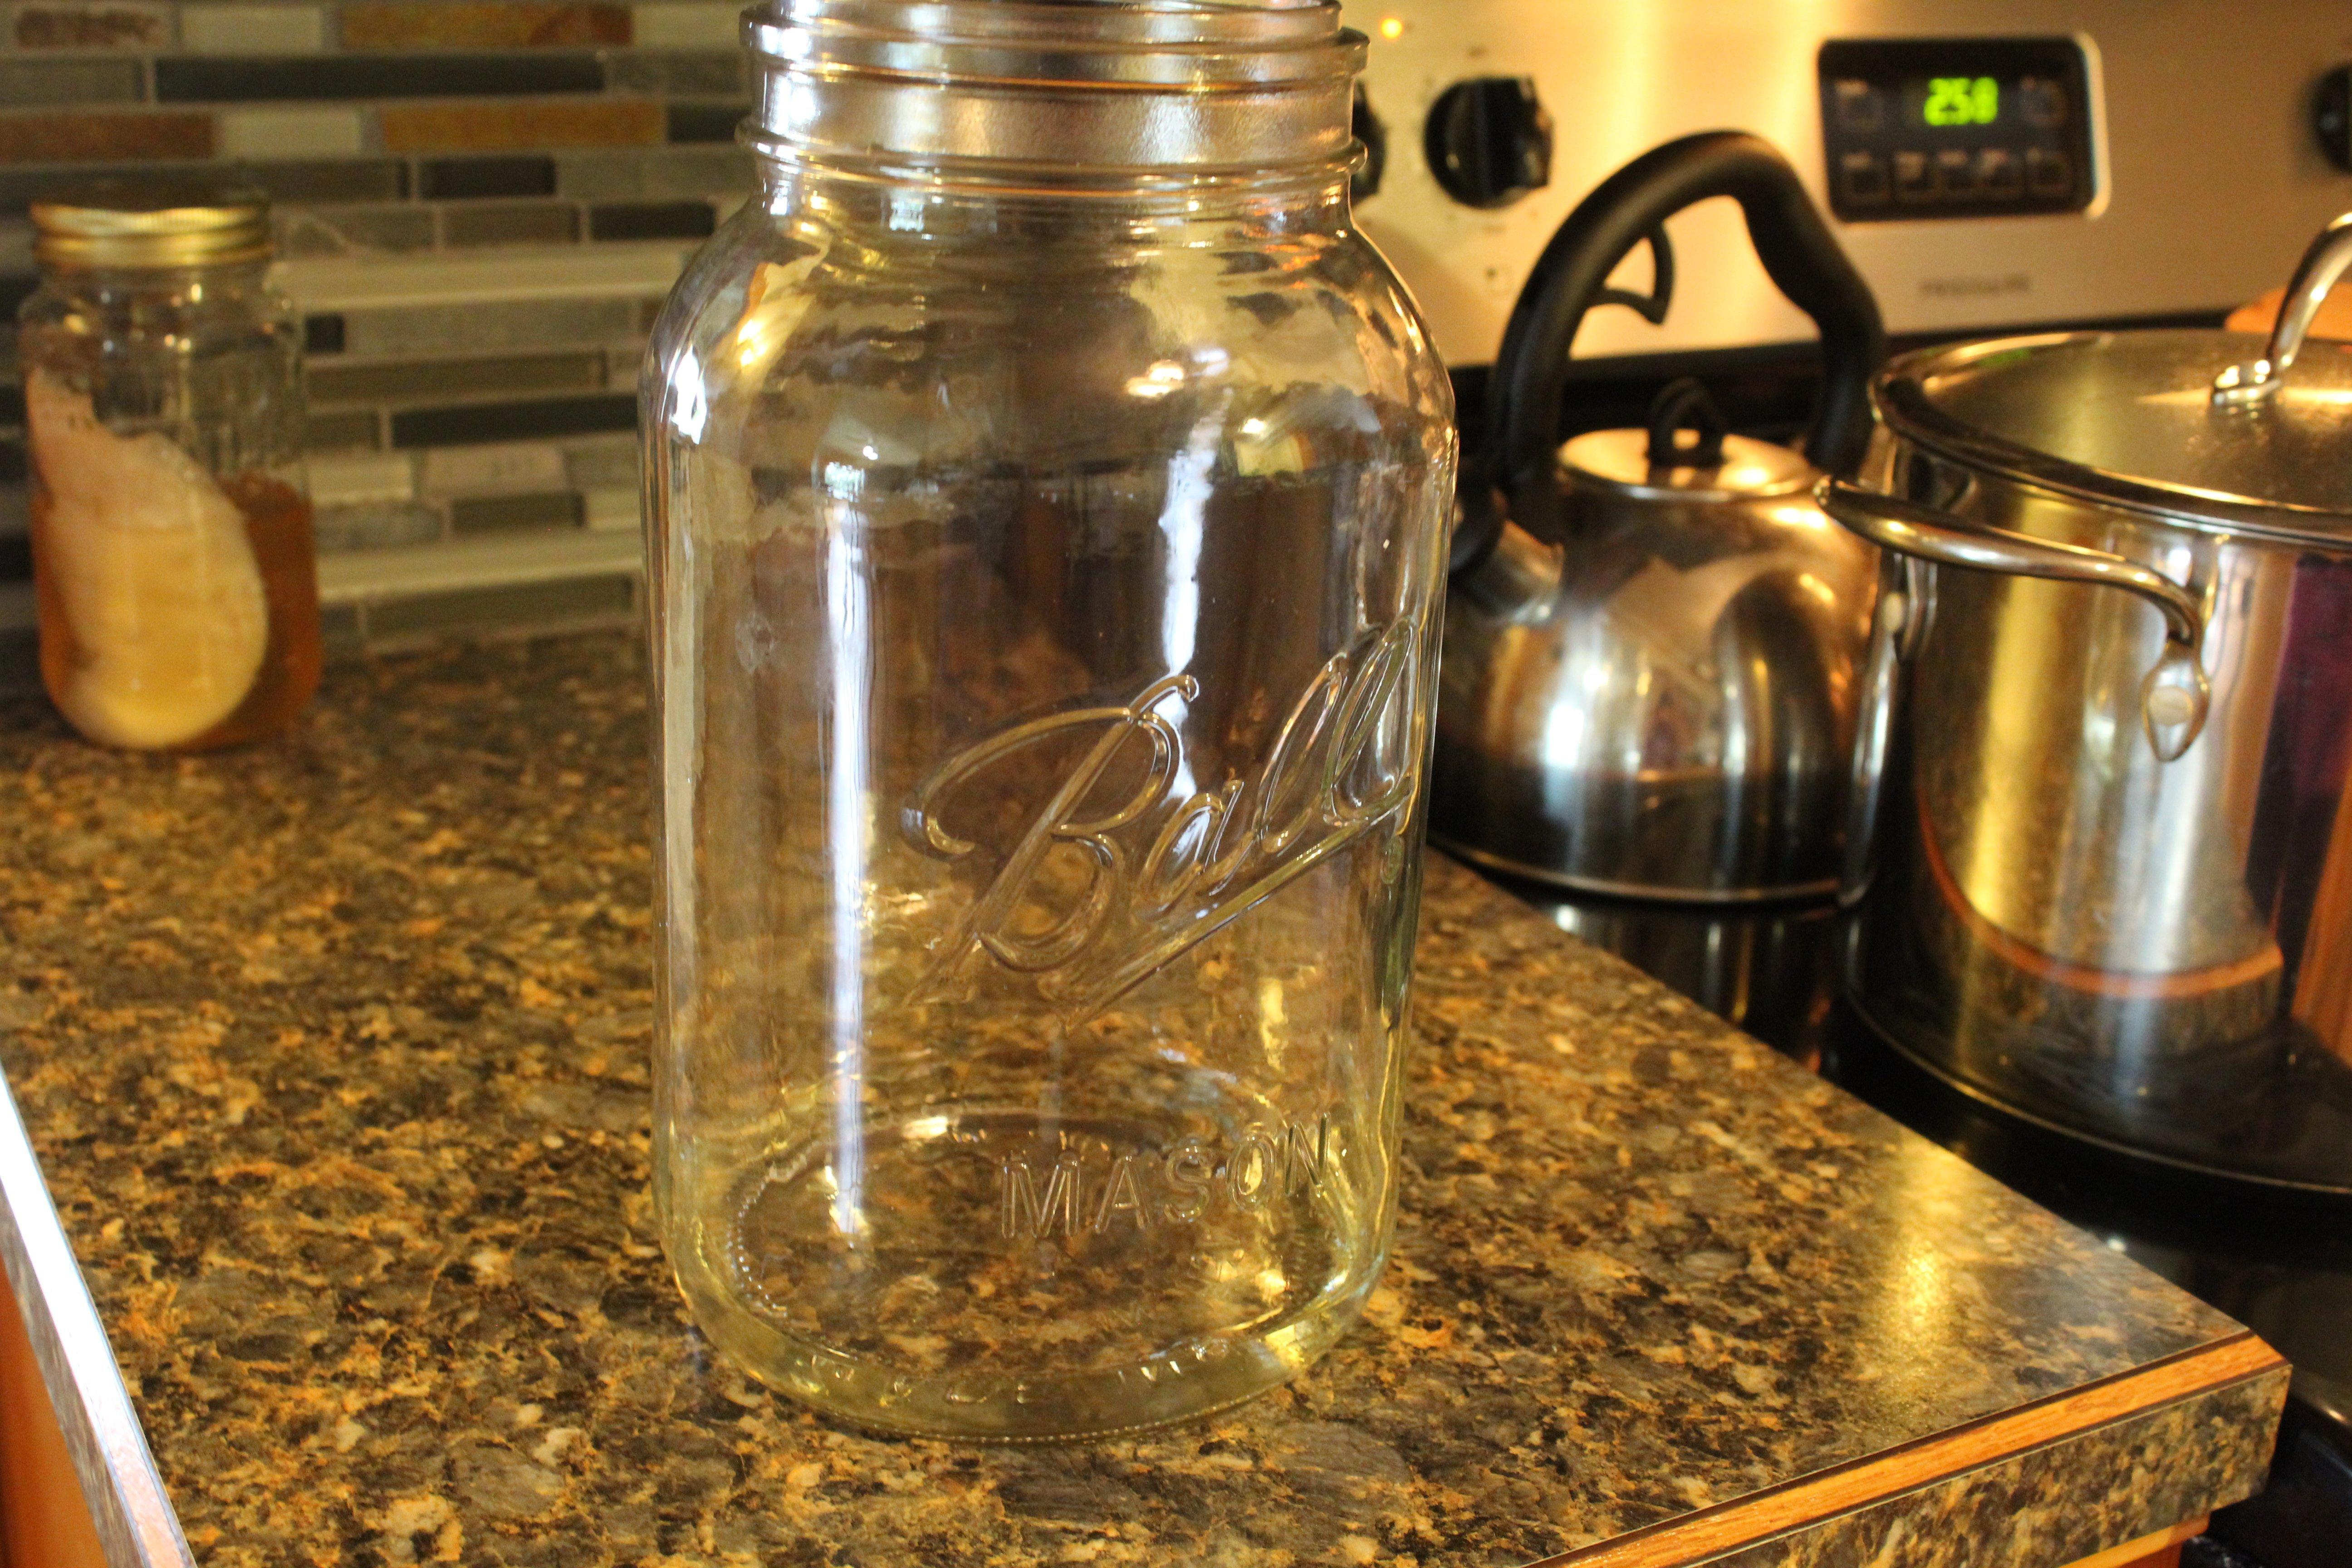 Large gallon size glass jar for Kombucha brewing